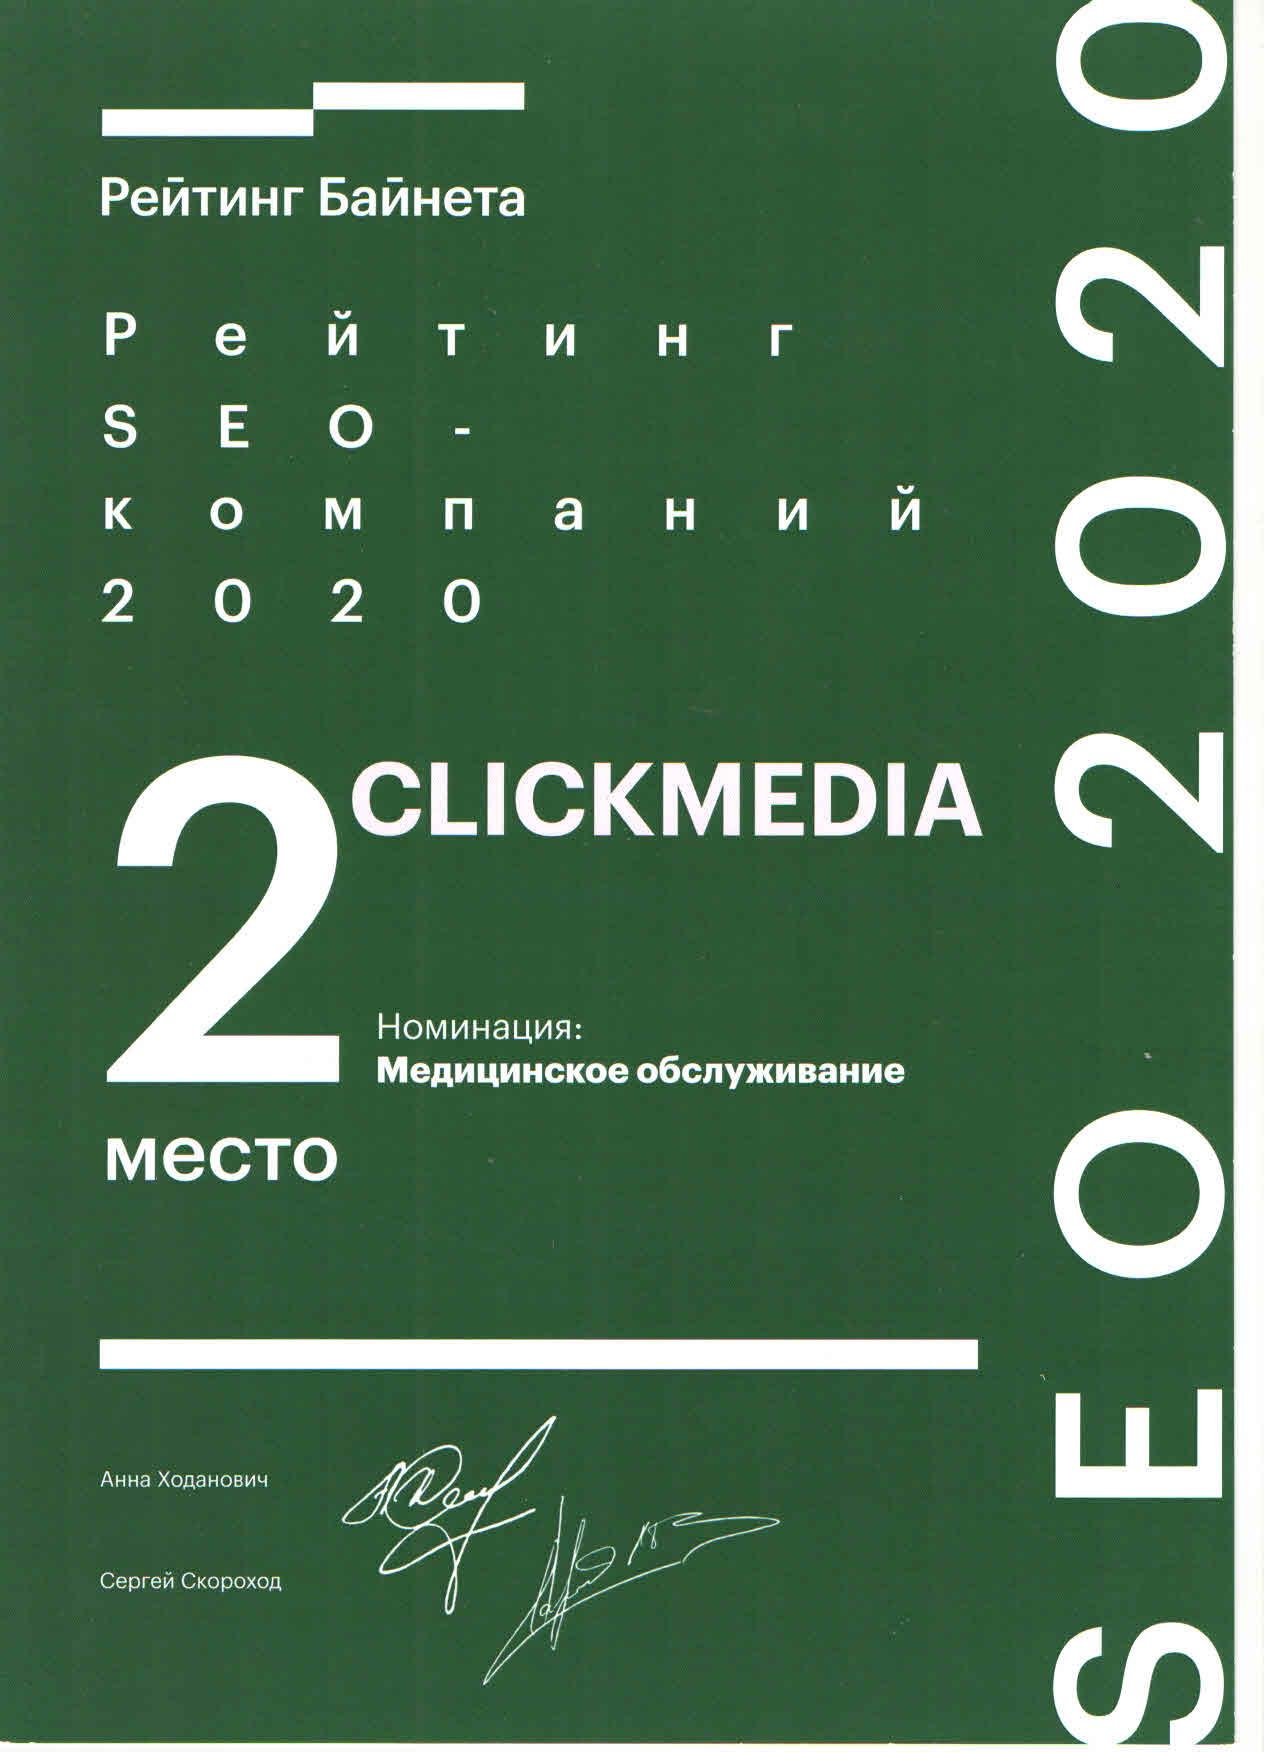 <b>2-е место</b> в рейтинге SEO-компаний Беларуси.<br>Номинация:<br><b>Медицинское обслуживание</b>